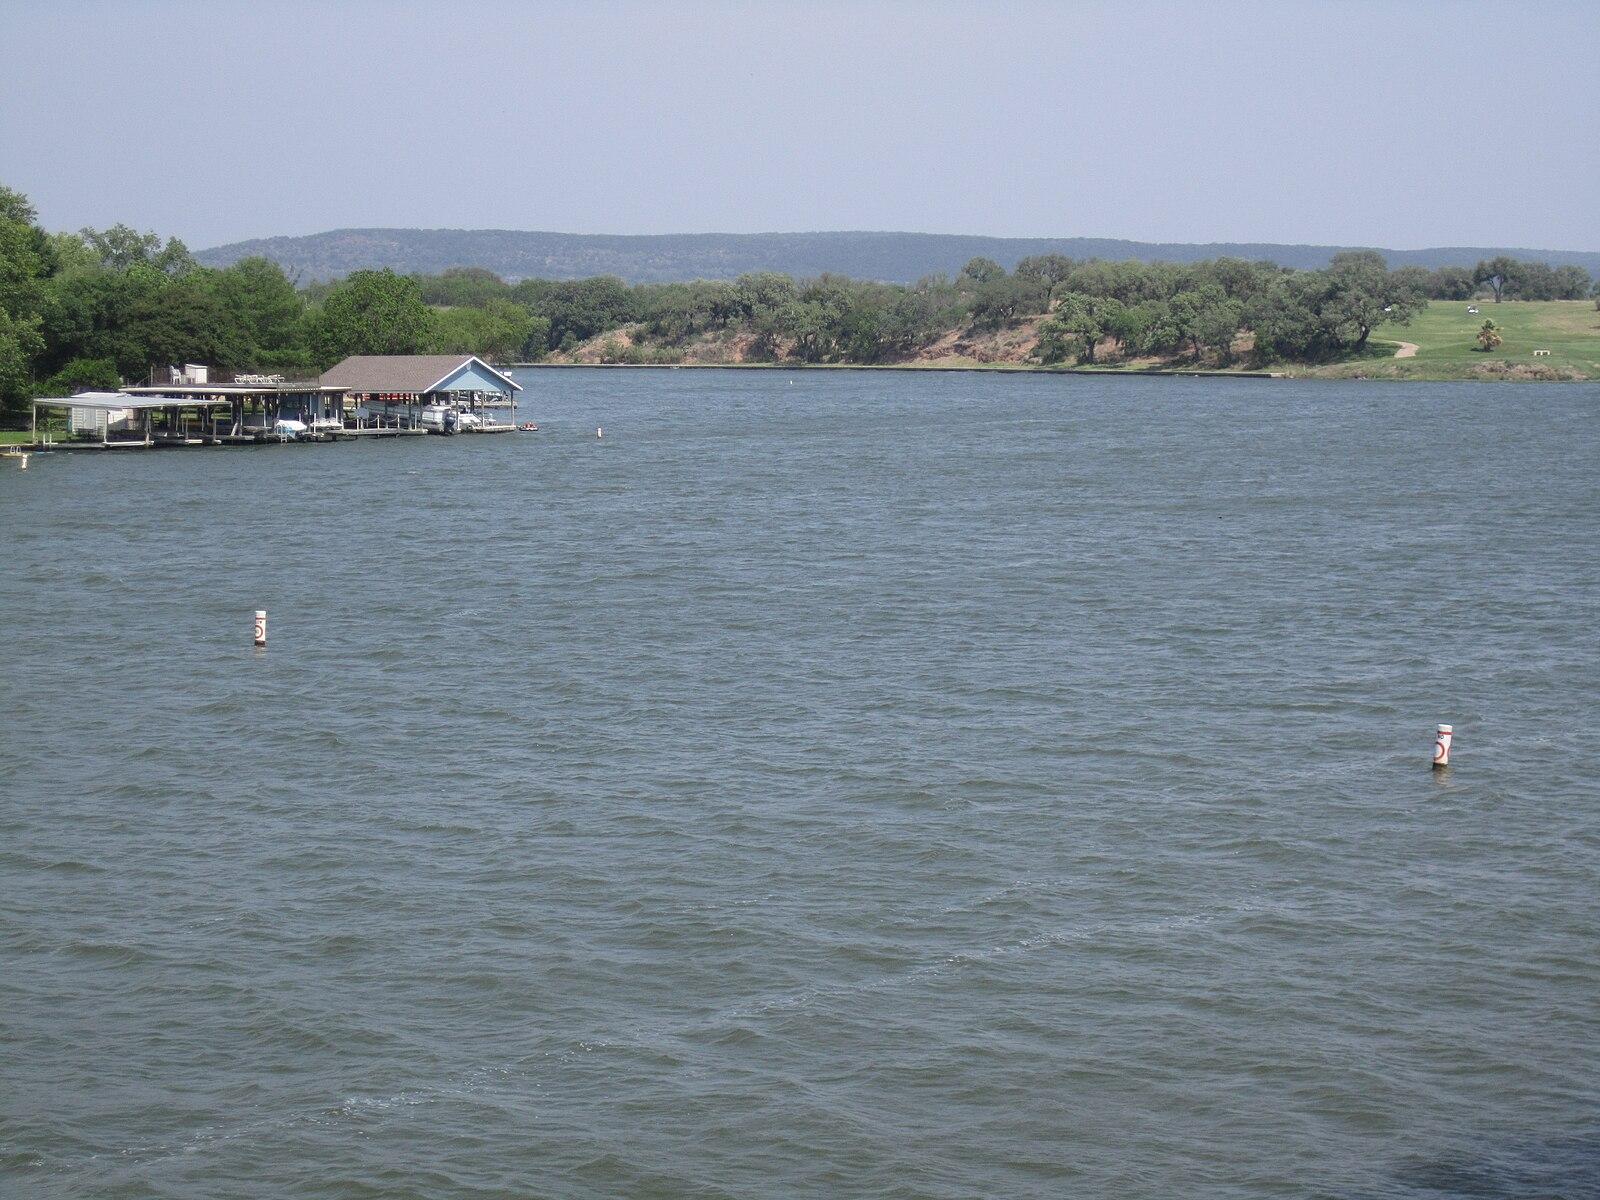 File:Sabine River, Bon Wier, Texas (Newton County Texas